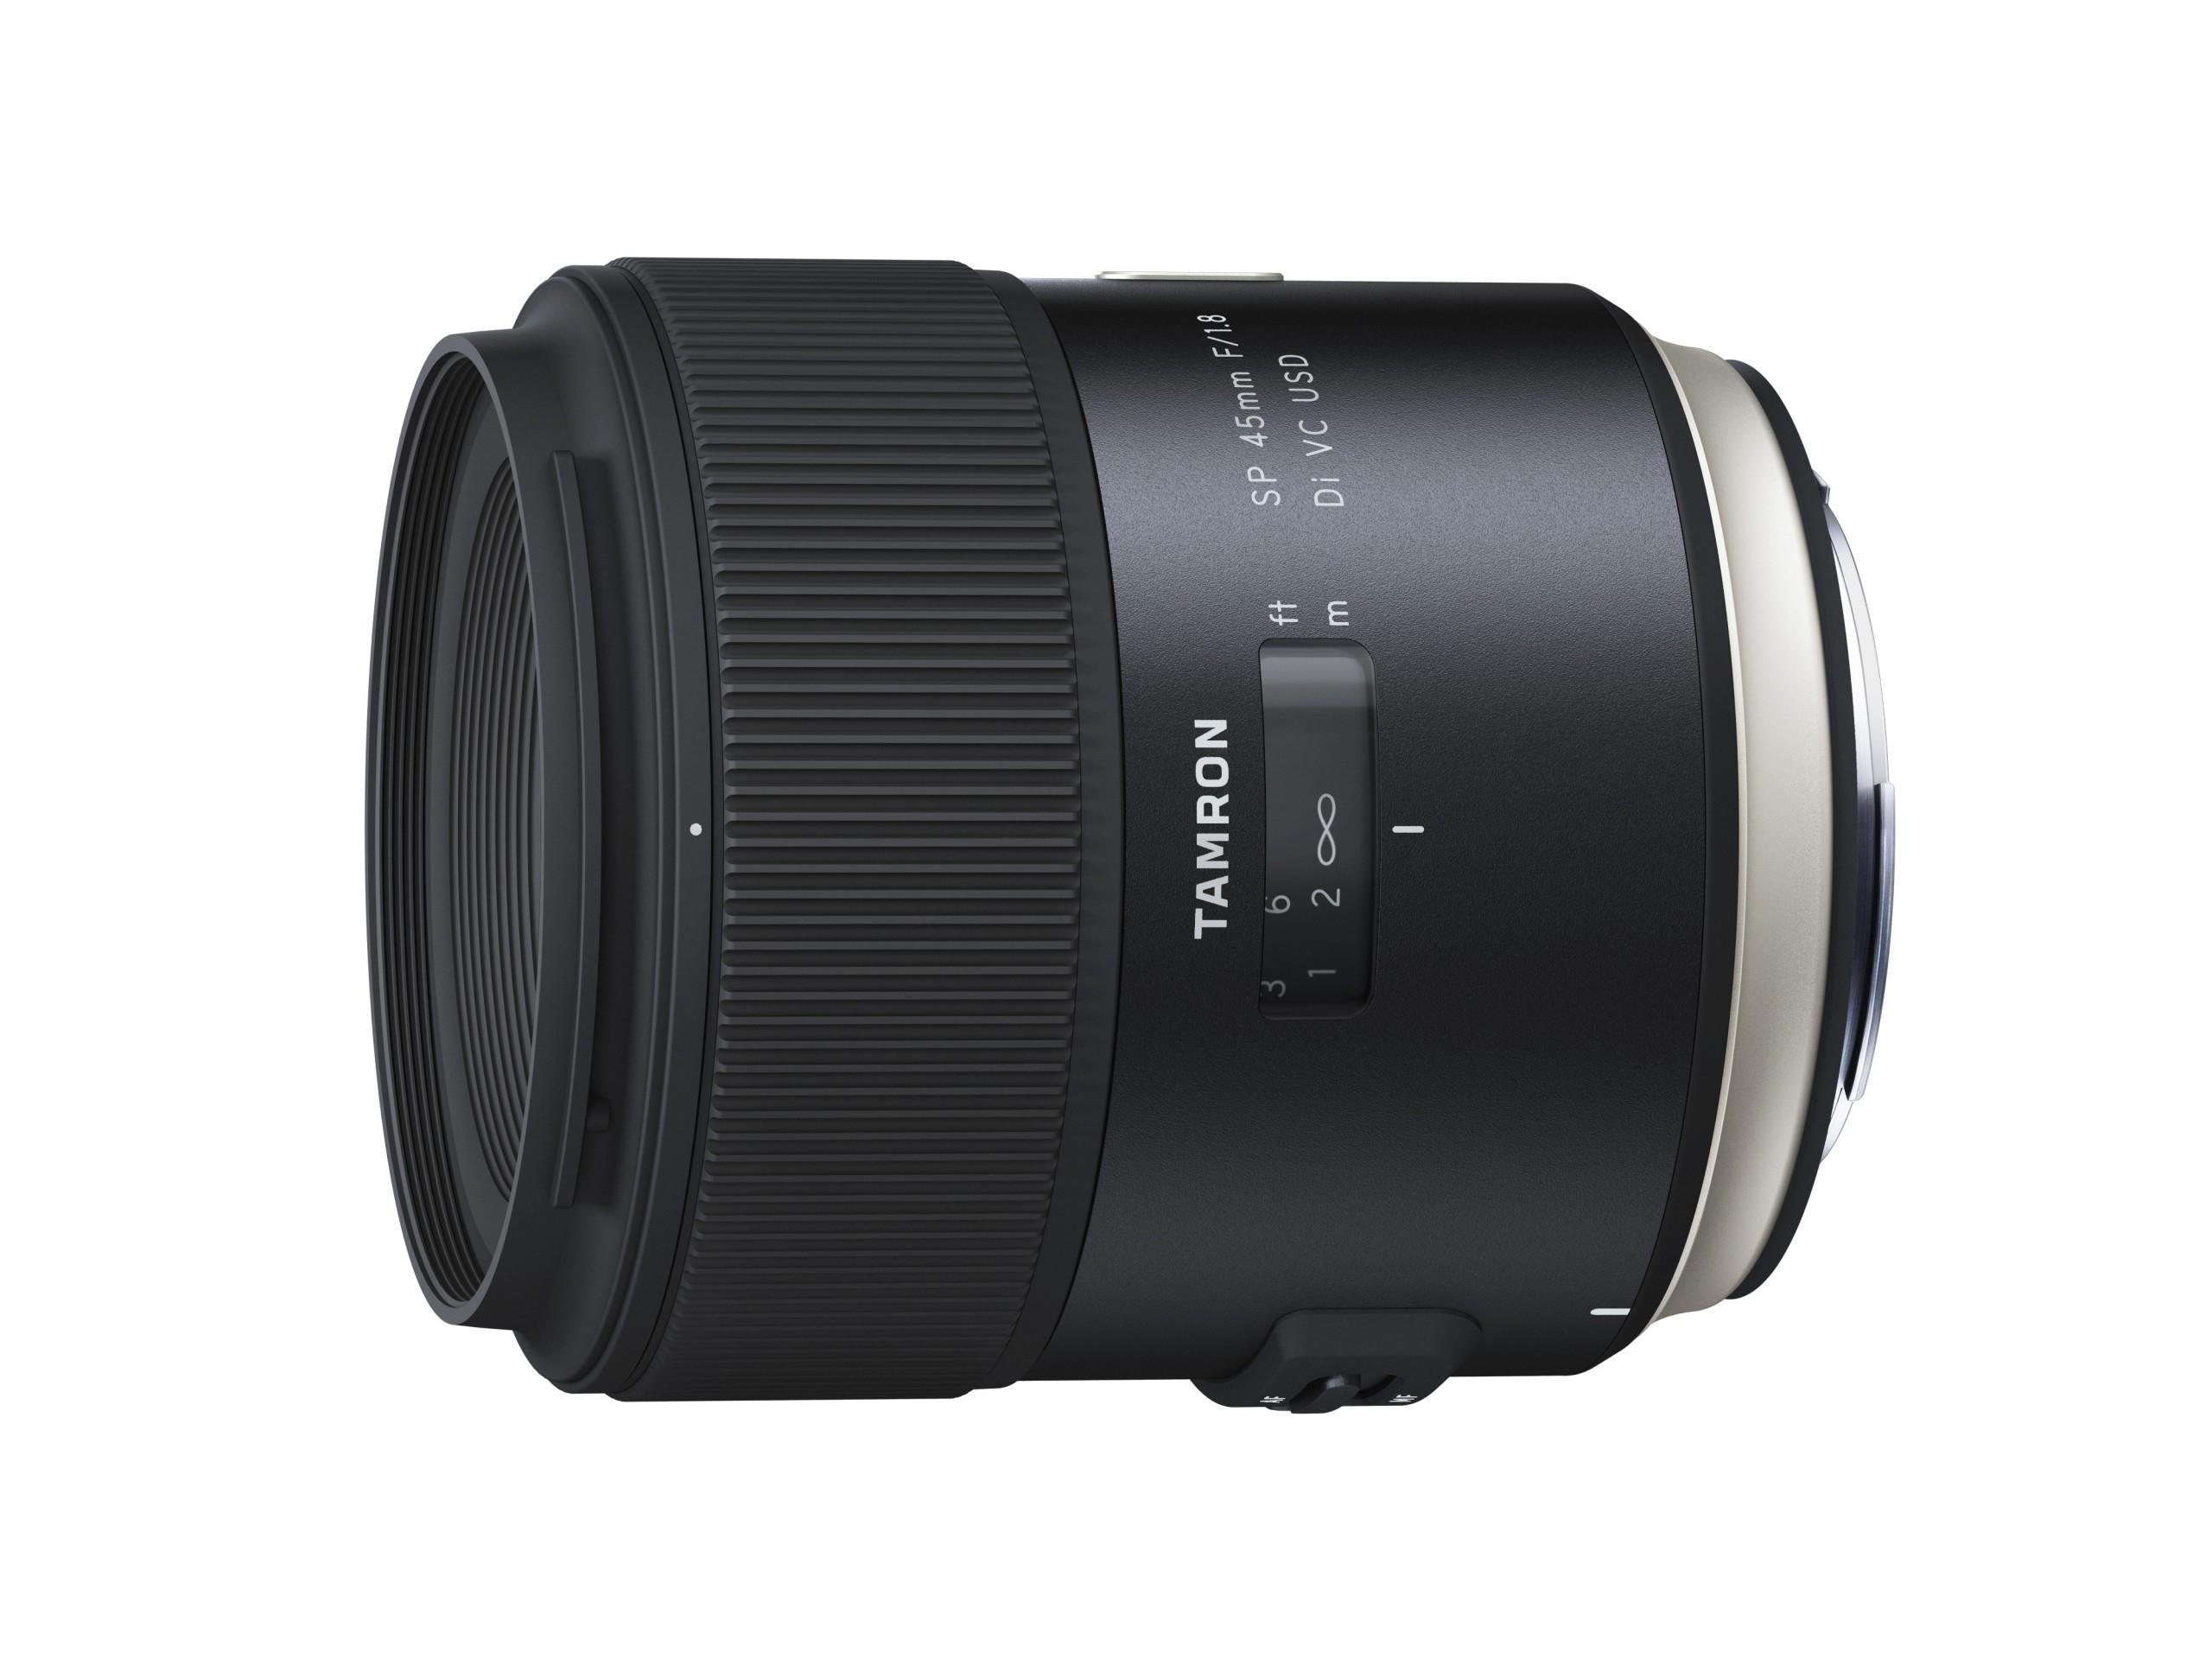 Tamron SP 45mm F1.8 Di VC para Canon, Nikon o Sony